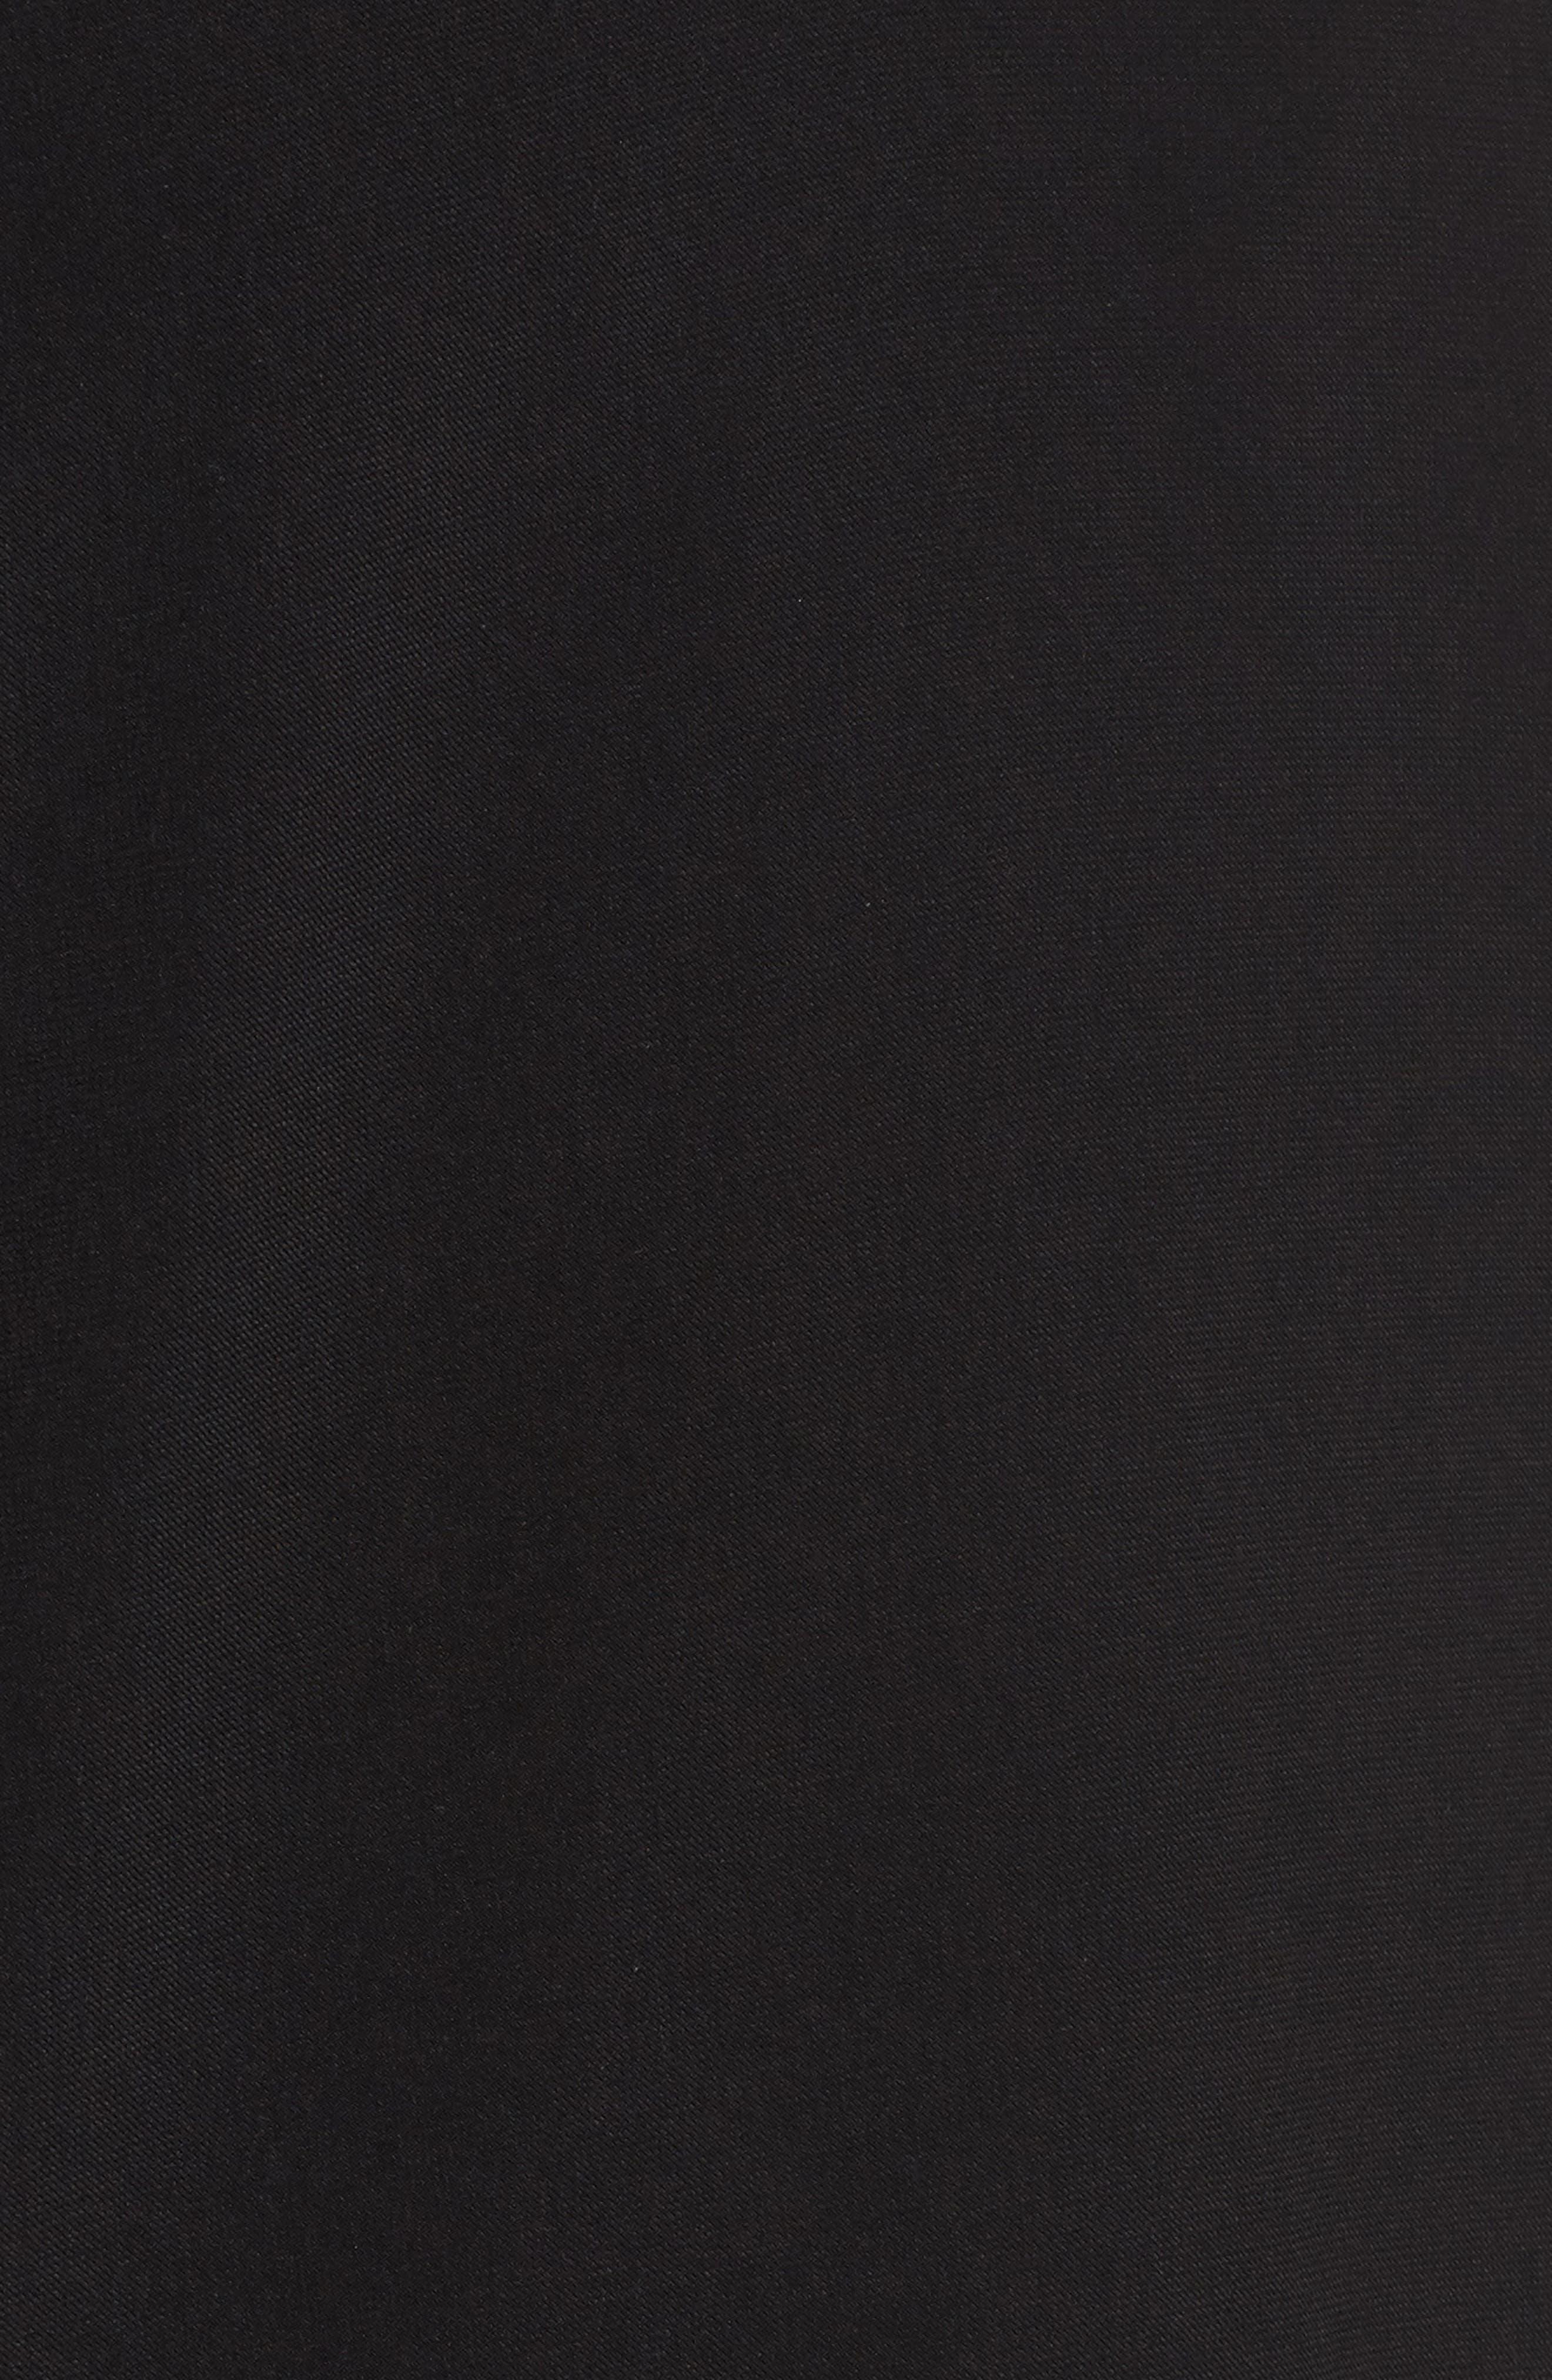 Choker Lace Top,                             Alternate thumbnail 5, color,                             Black